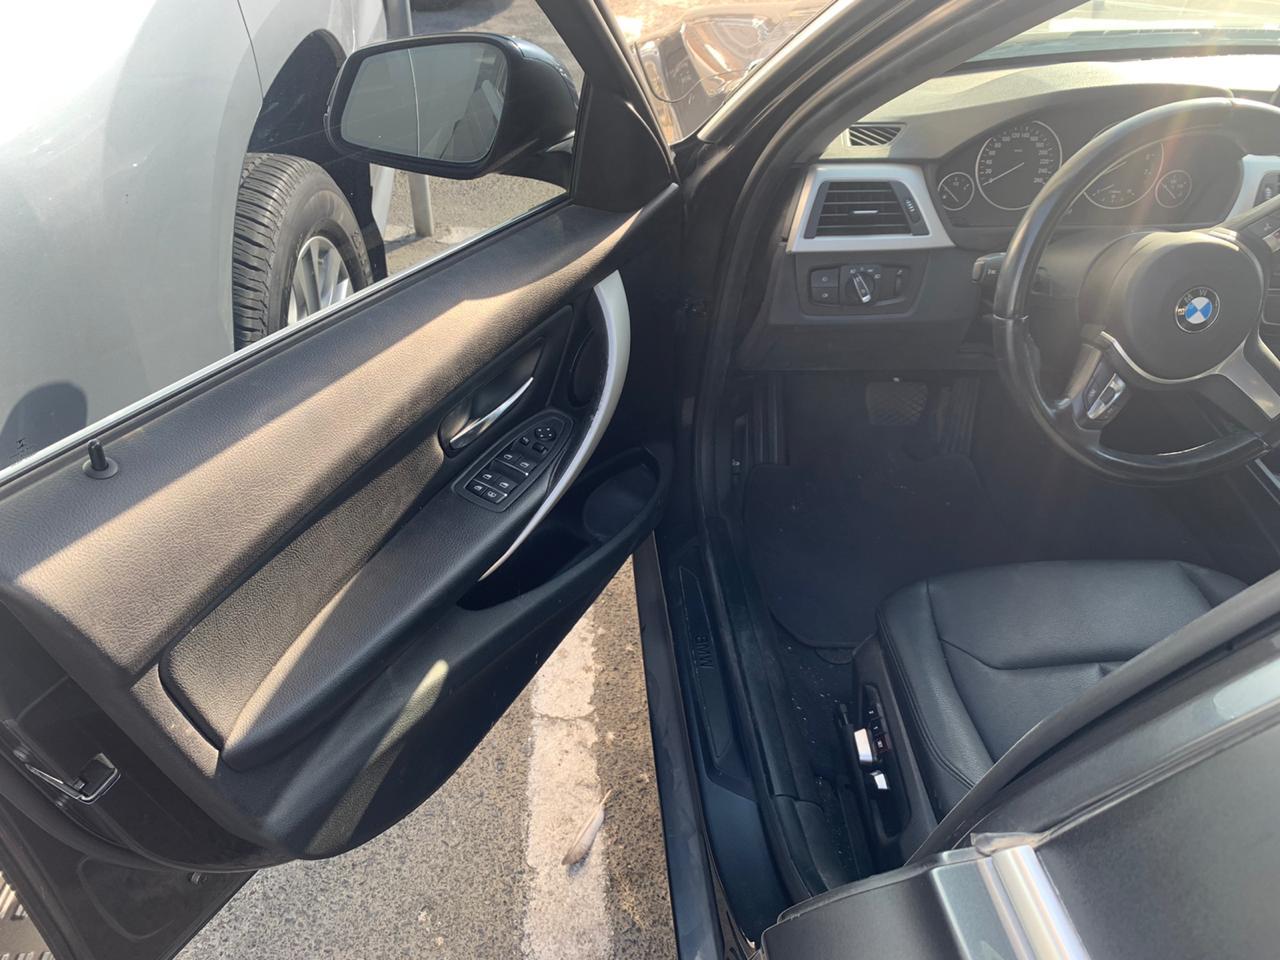 BMW 318i Metal Grey in Dubai - Image 8